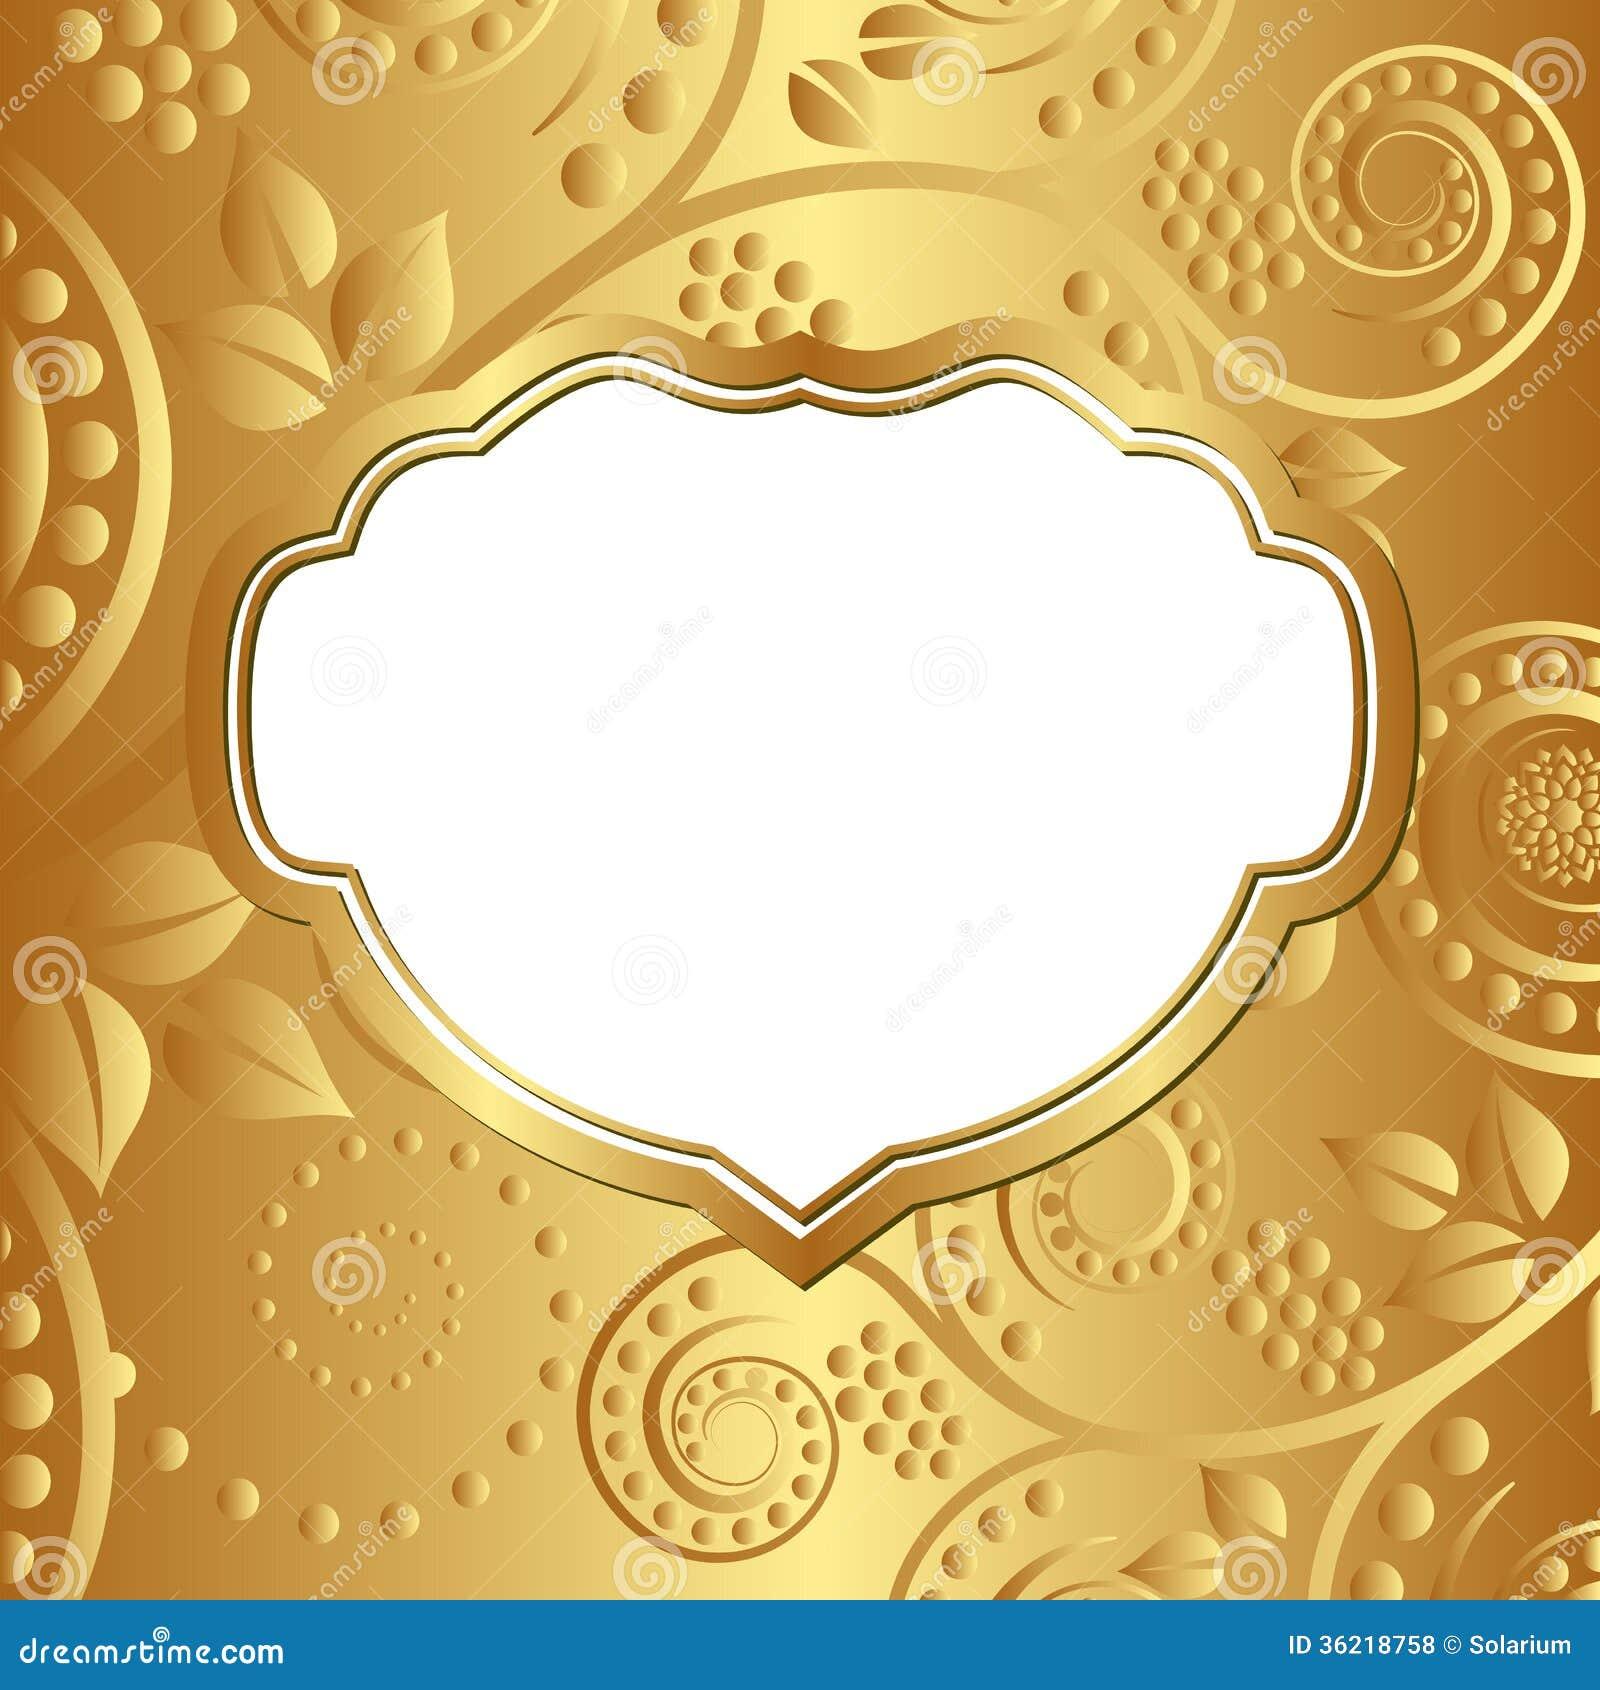 vector islamic decorations l